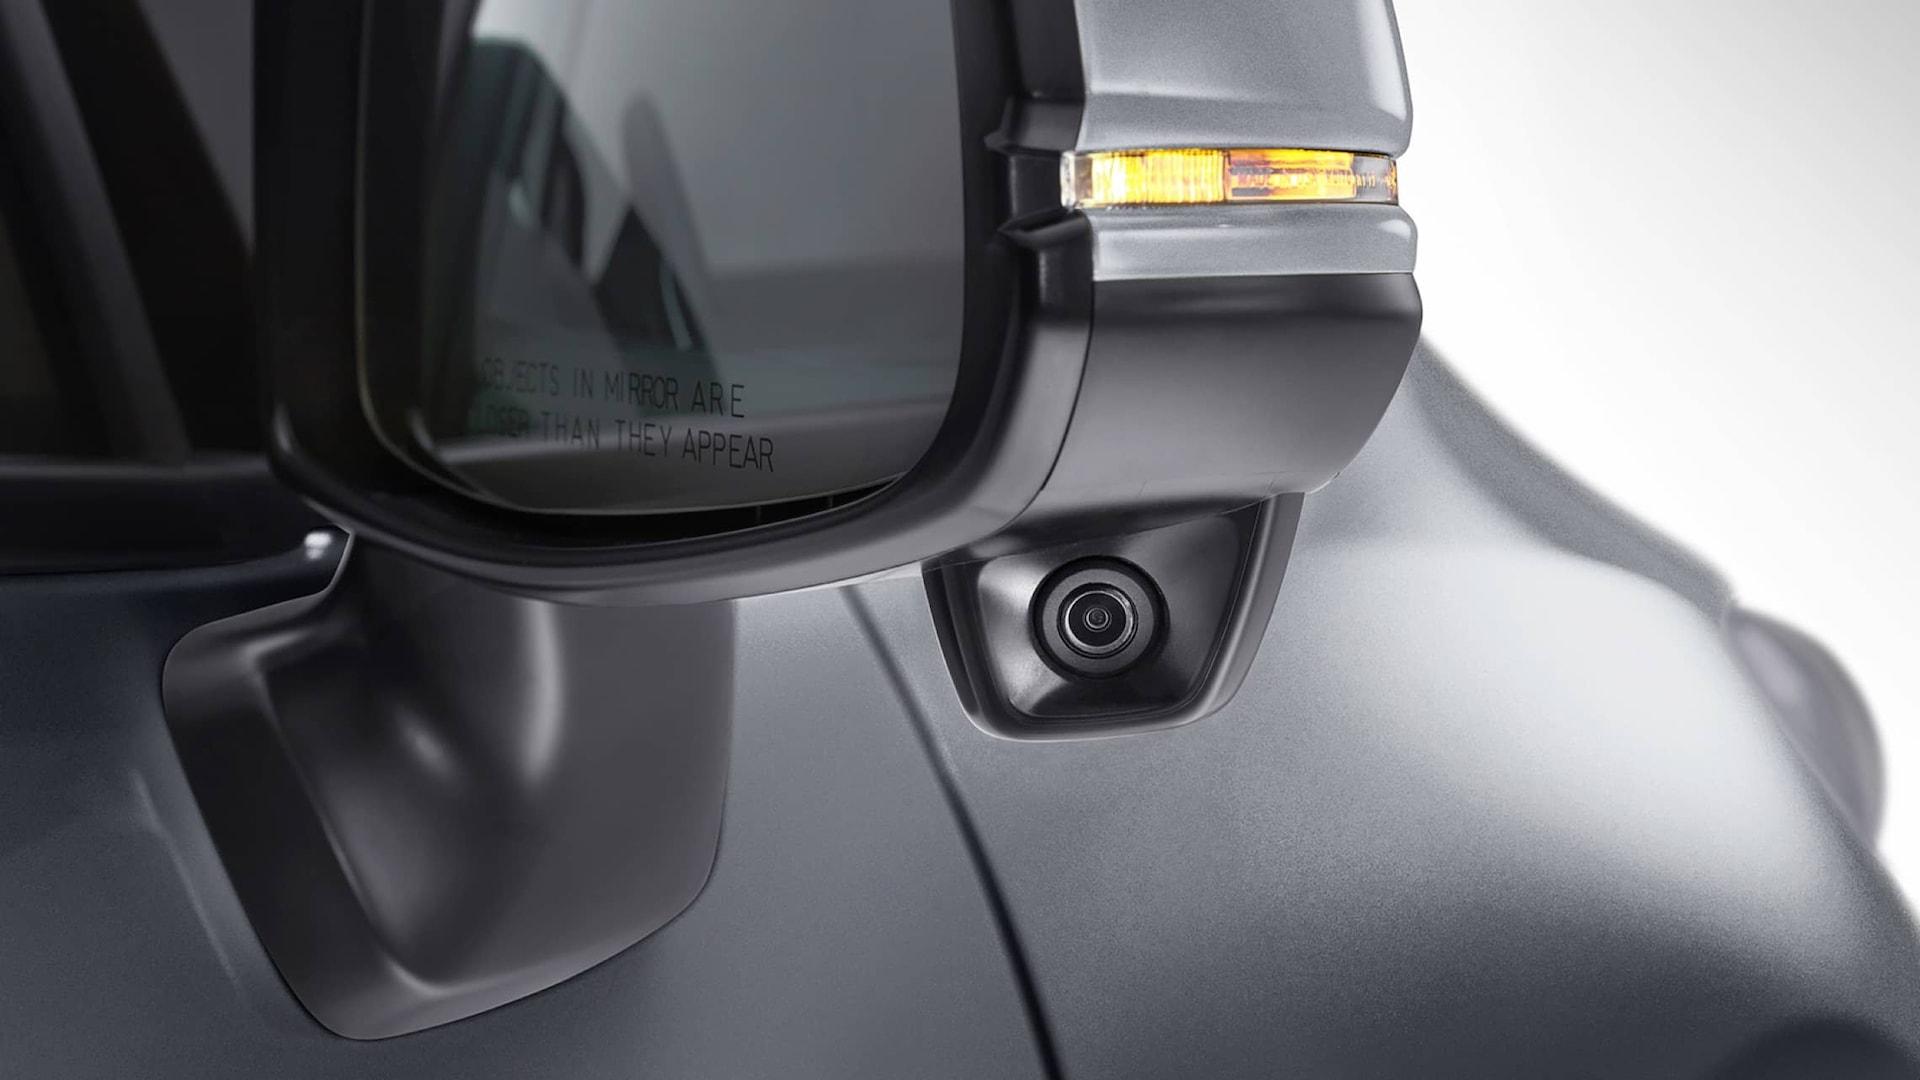 Vista en primer plano exterior de la característica Honda LaneWatch™ en el espejo del lado del pasajero en el Honda Fit EX-L2019.